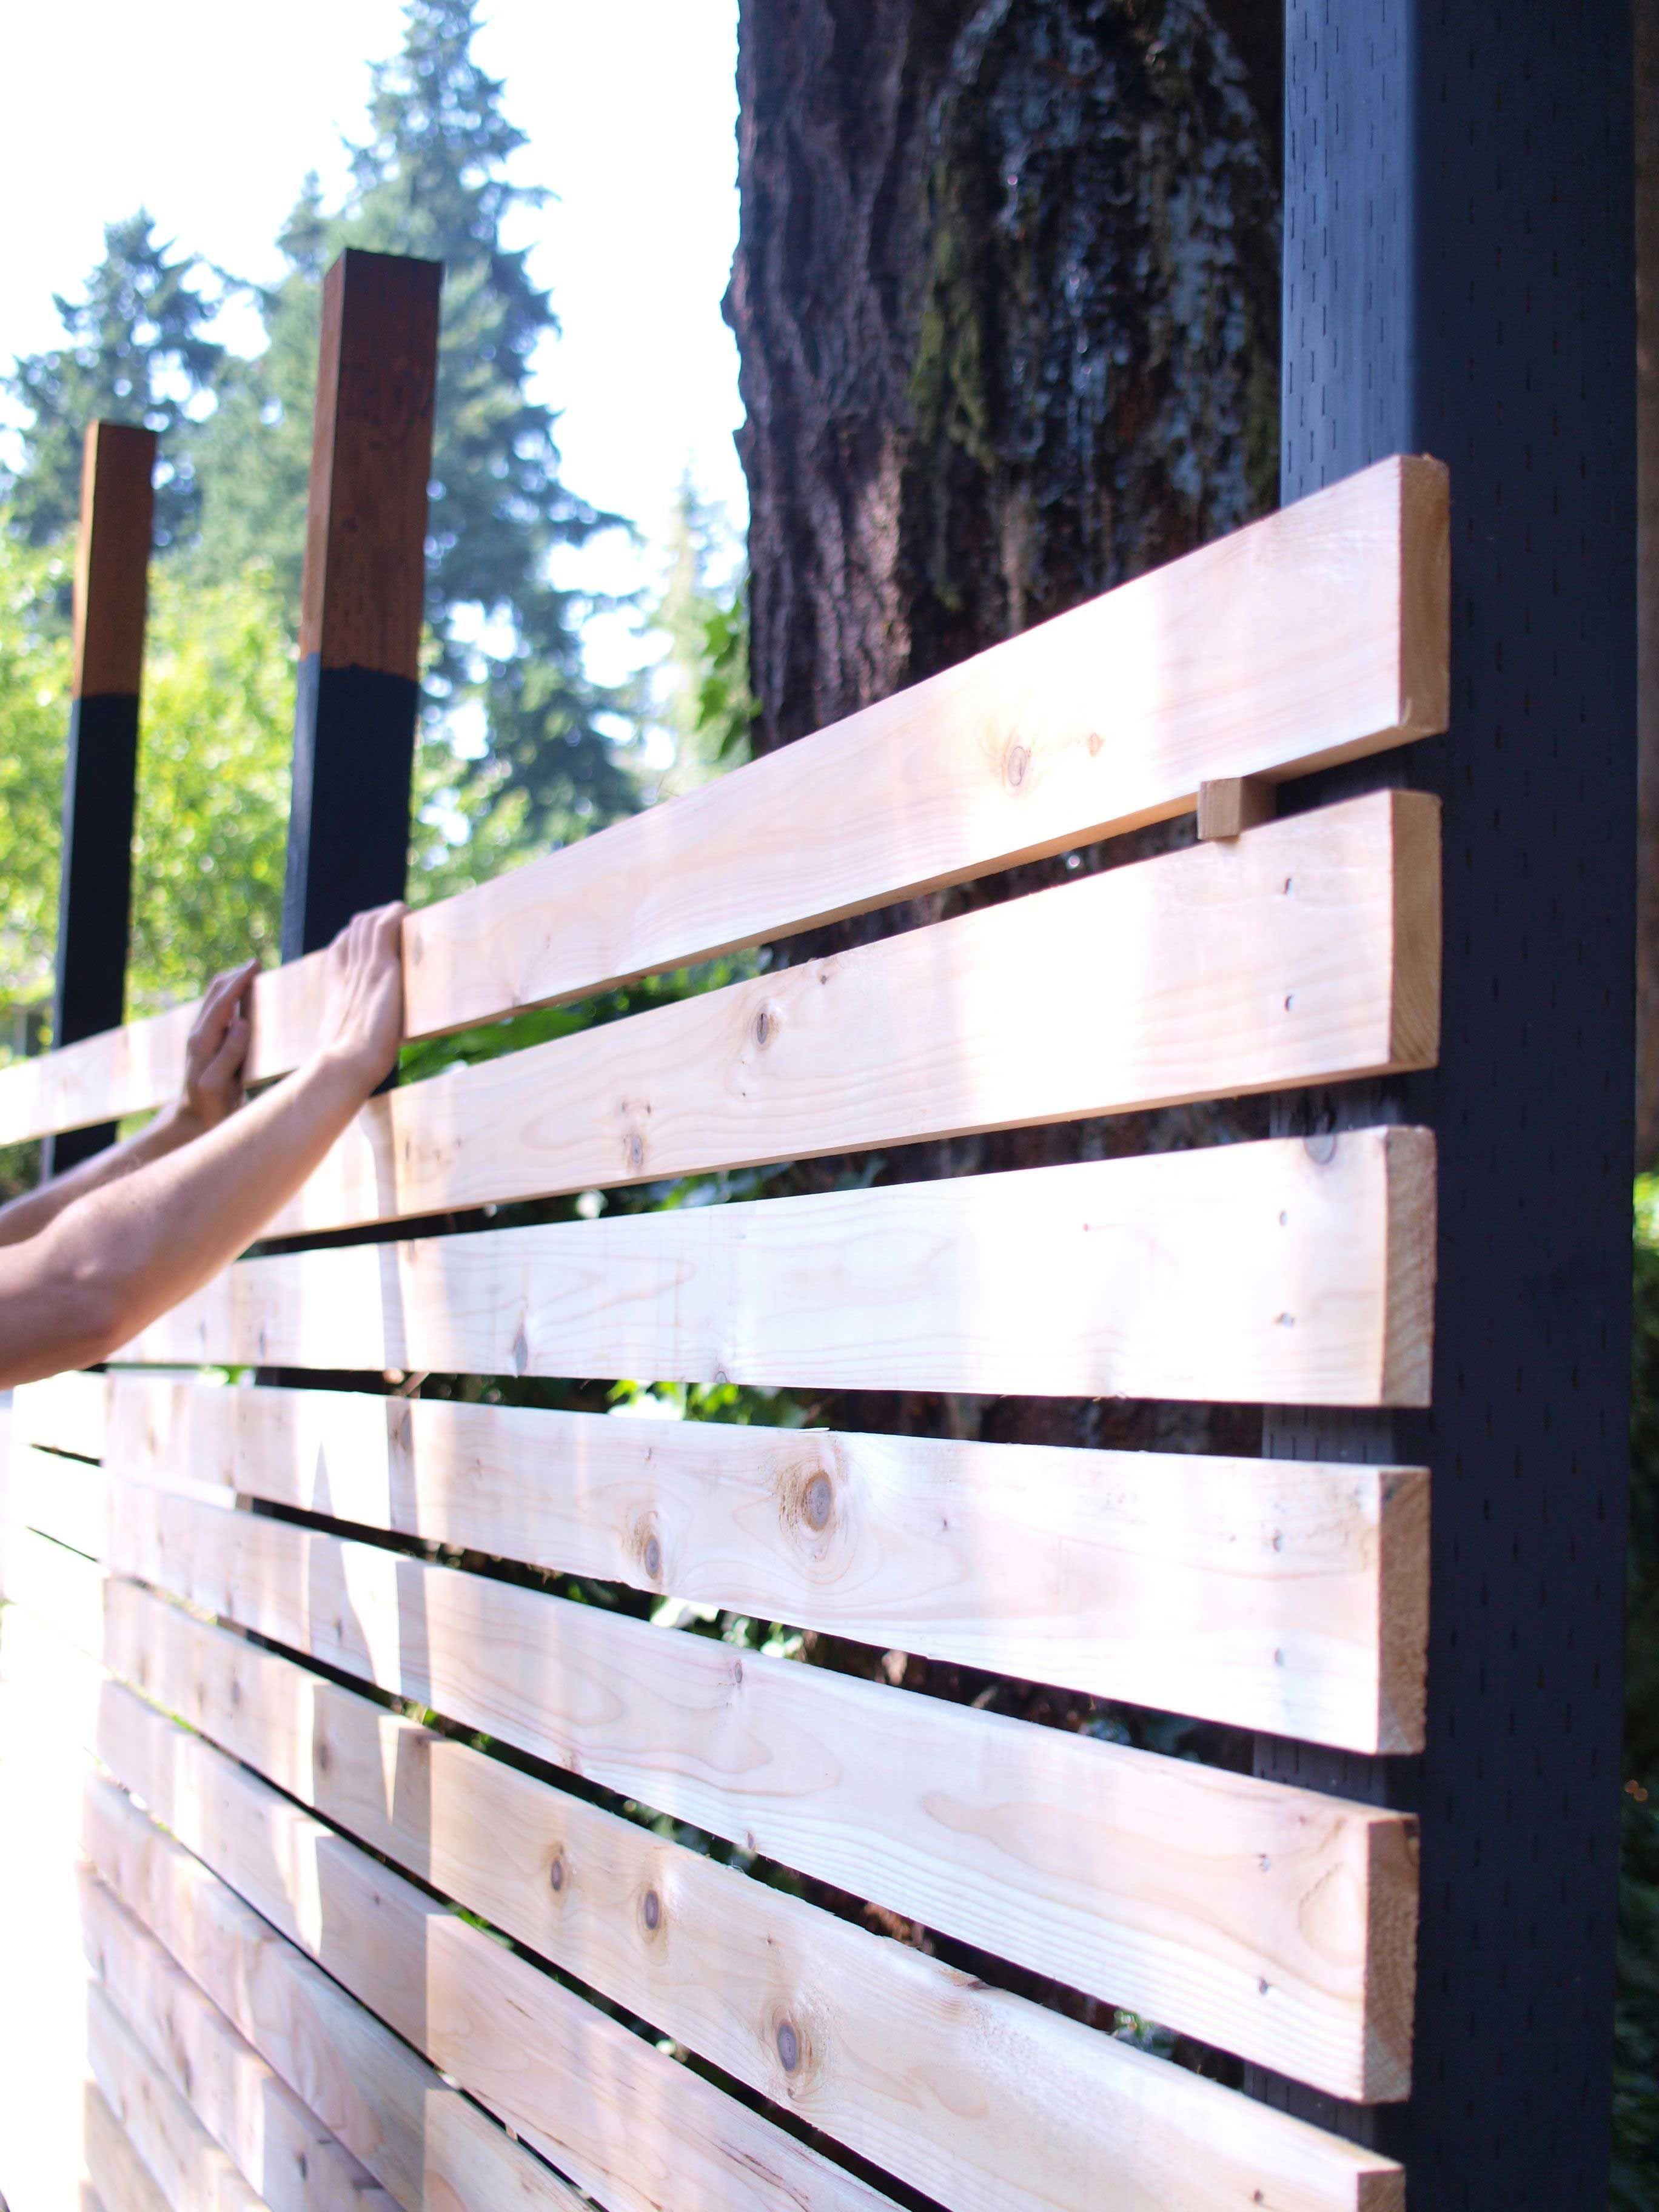 How To Build A Diy Backyard Fence Part Ii Diy Backyard Fence